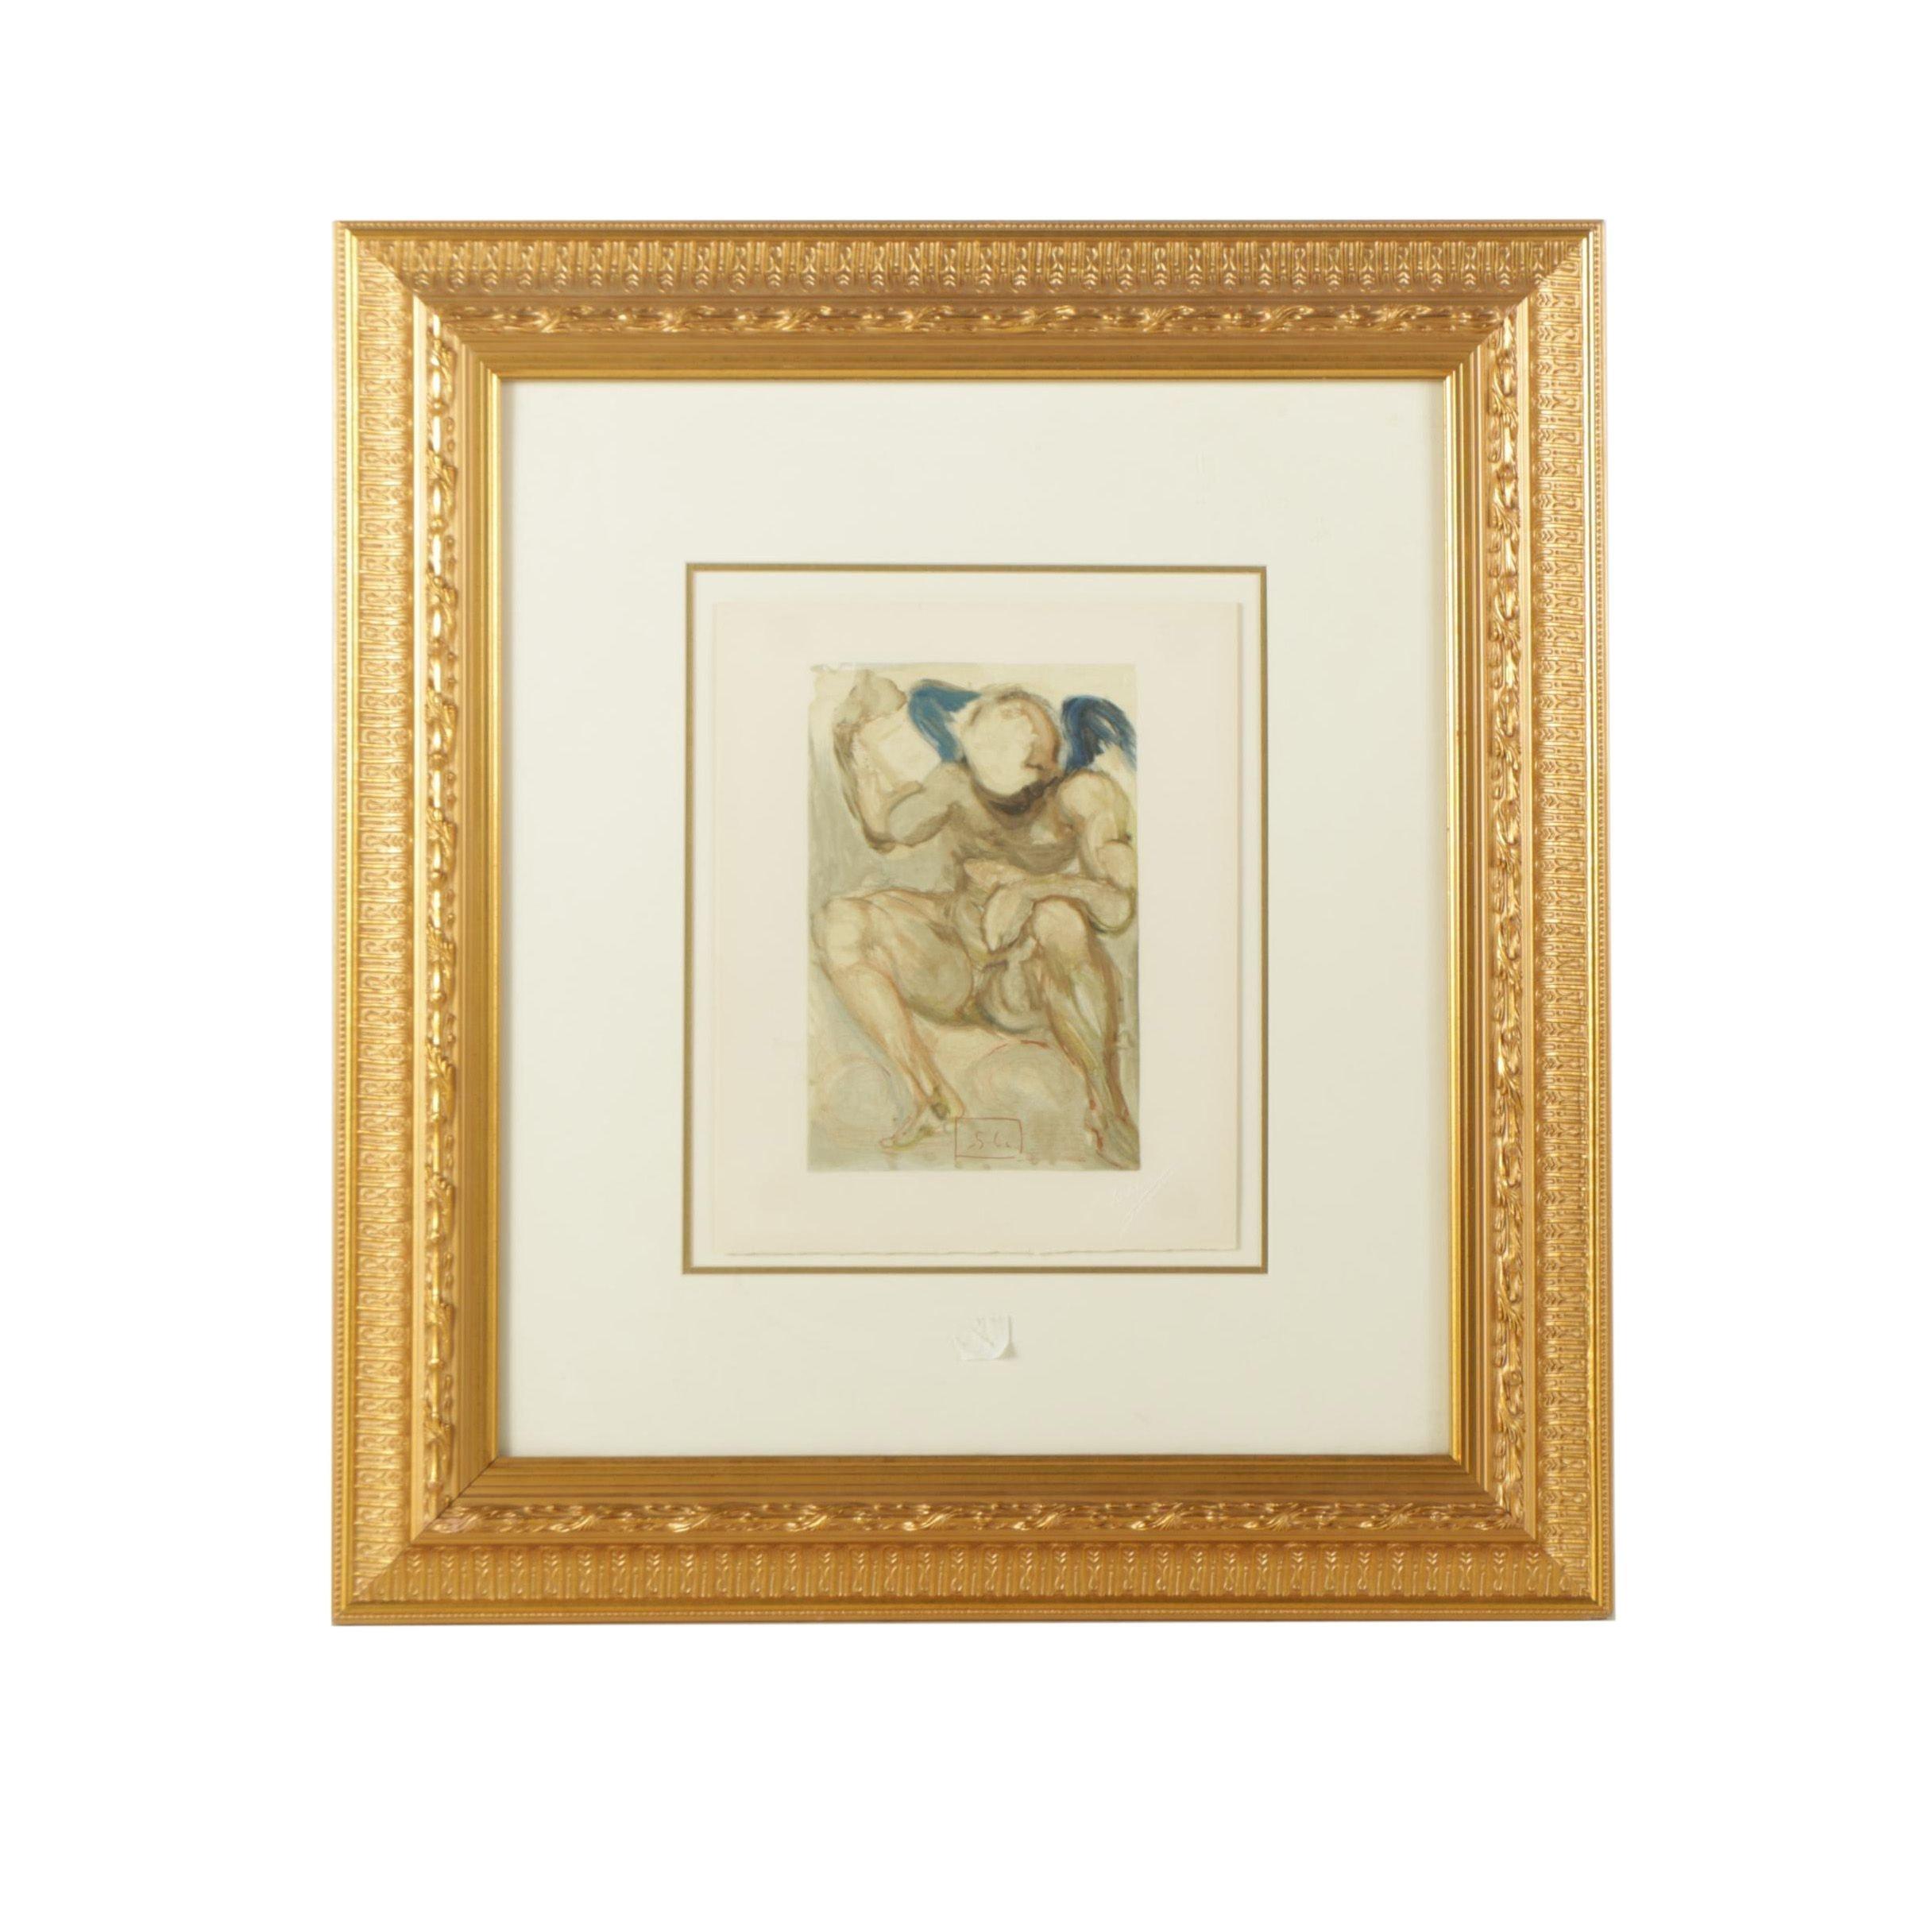 "Salvador Dali Wood Engraving on Paper "" Purgatory Canto 15"""